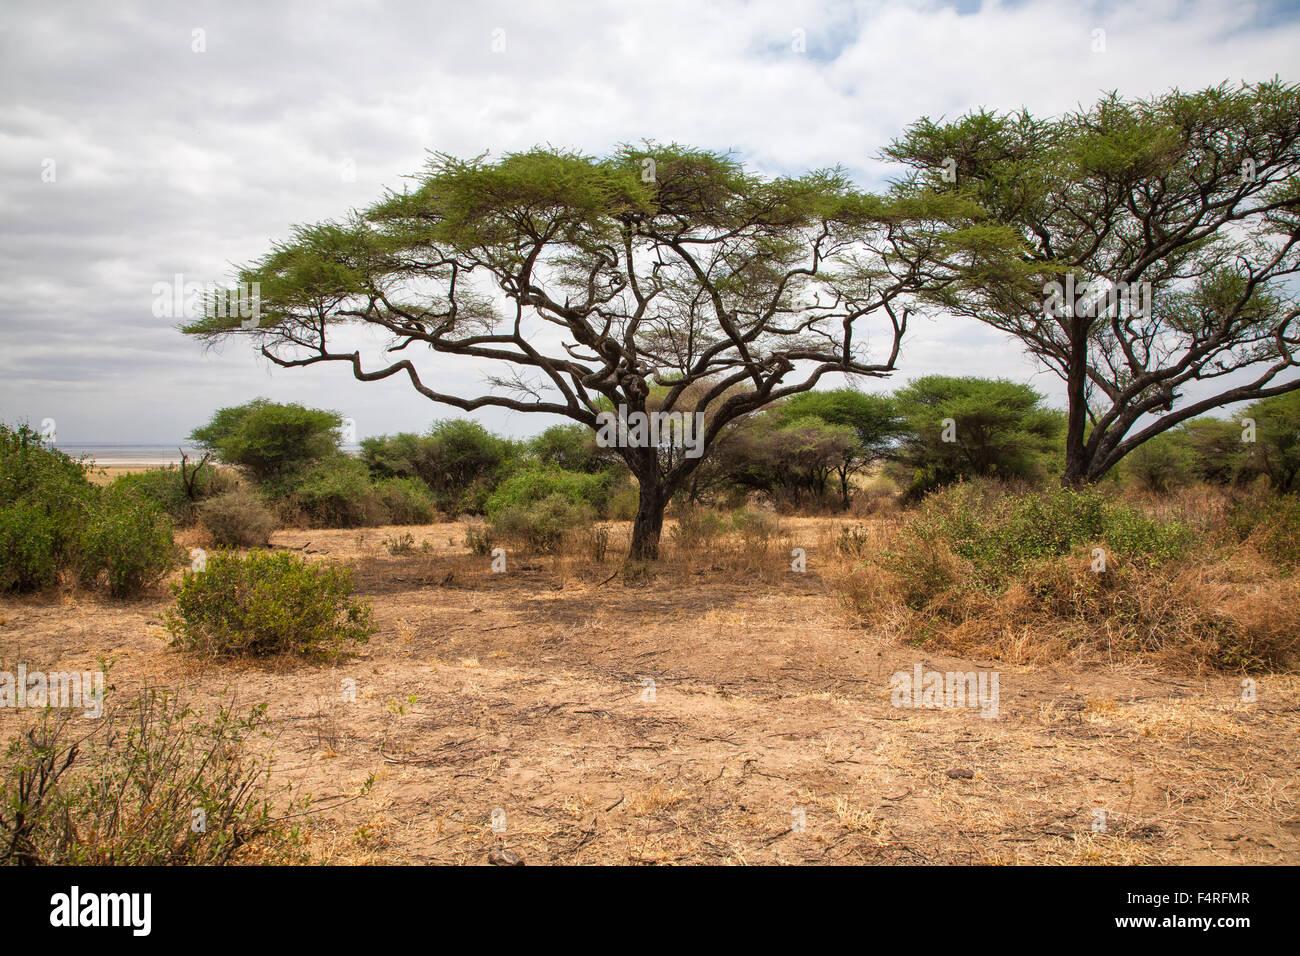 Africa, trees, Lake Manyara, national park, scenery, landscape, safari, travel, savanna, Tanzania - Stock Image